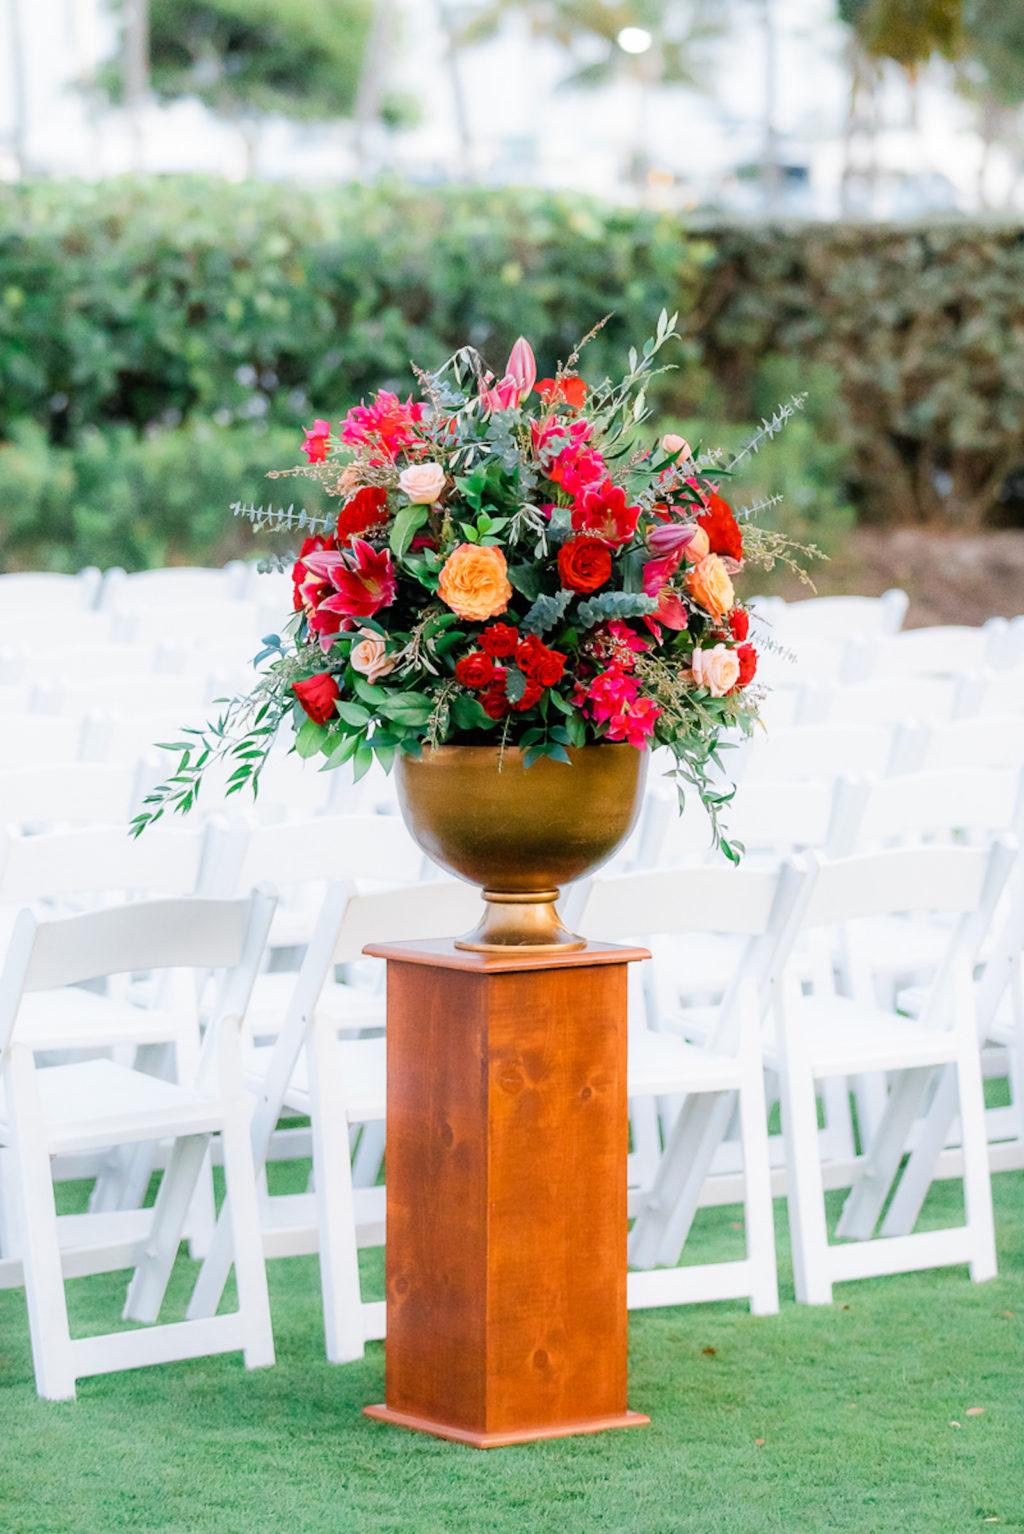 Elegant Wedding Ceremony Decor, Tall Wooden Pedestal, Gold Vase with Jewel Tone Red, Orange, Pink Roses Greenery Floral Arrangement